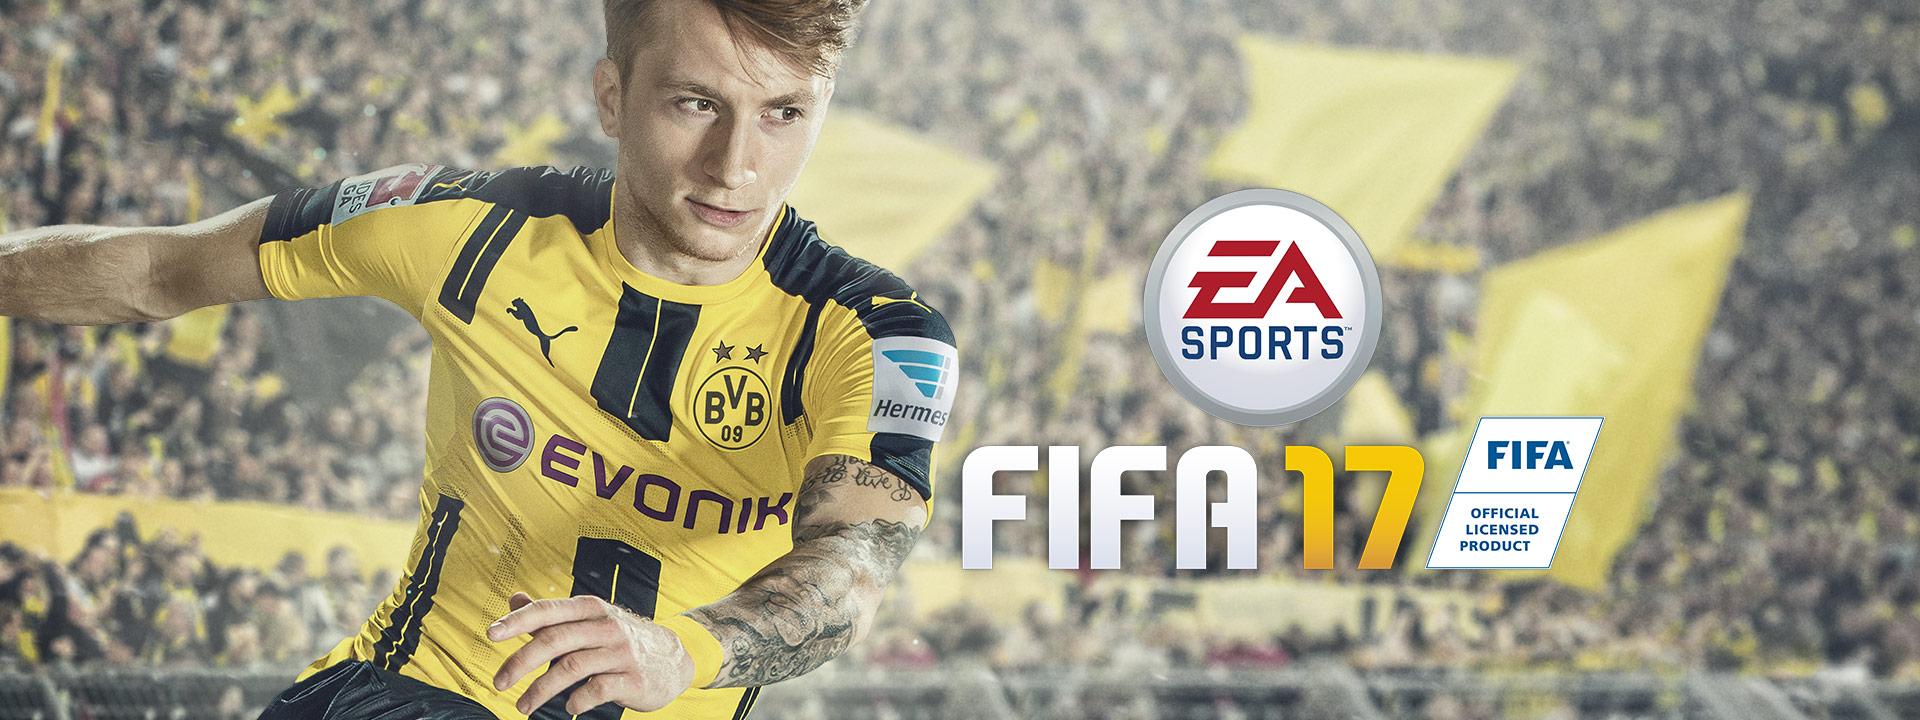 NUEVA ACTUALIZACION FIFA 17 - FUT CHAMPIONS TENDRÀ UN VALOR DE 30 K EN MONEDAS